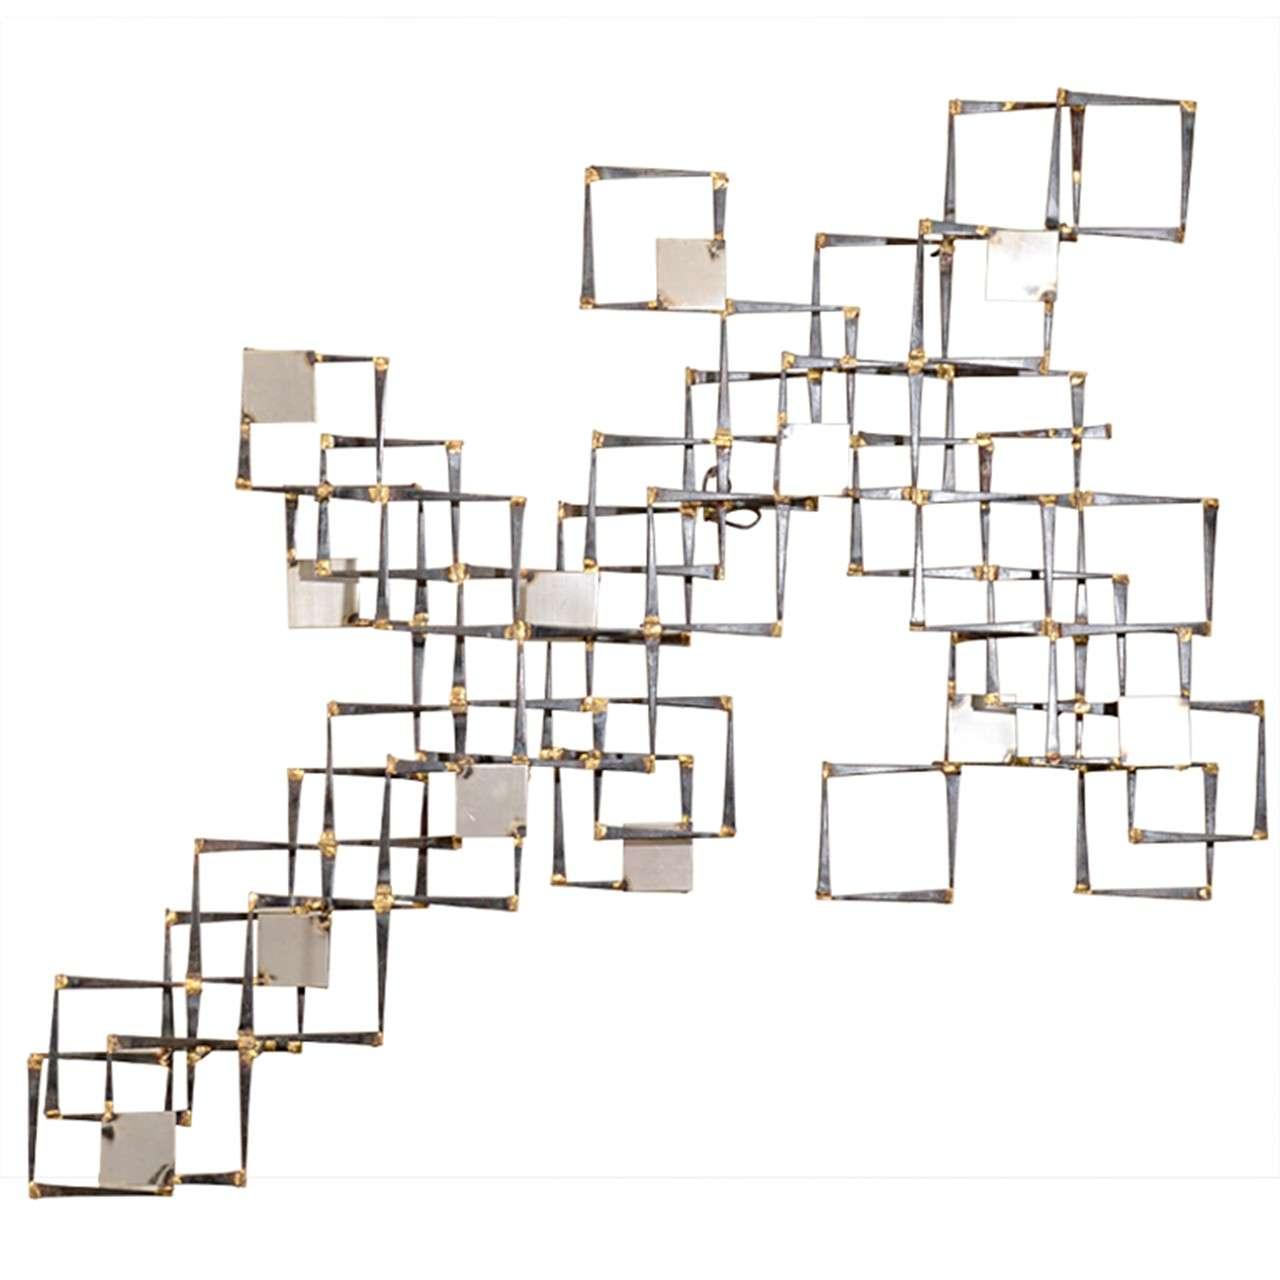 mid century mix metal geometric wall sculpture at 1stdibs. Black Bedroom Furniture Sets. Home Design Ideas